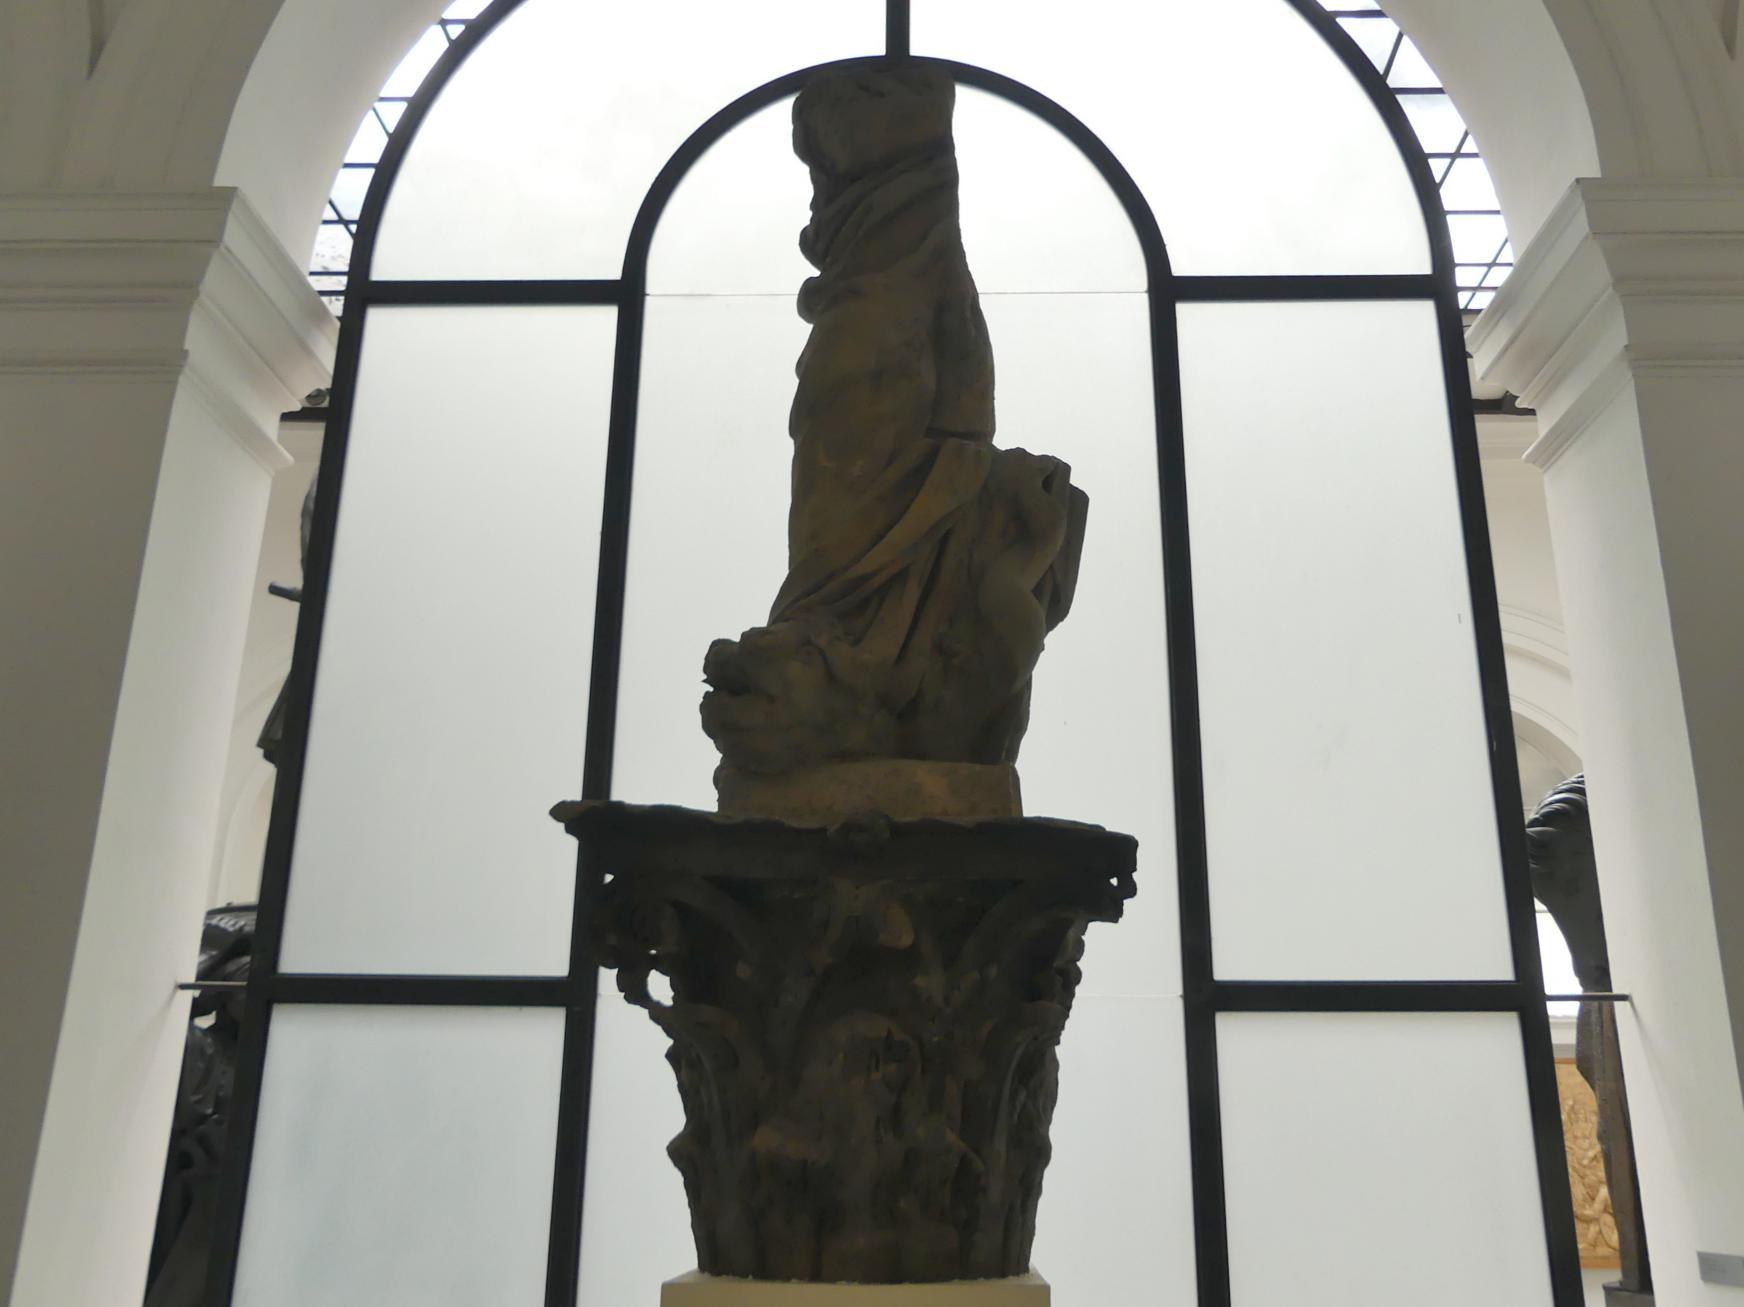 Johann Georg Bendl: Fragment der Skulptur Immaculata, 1650